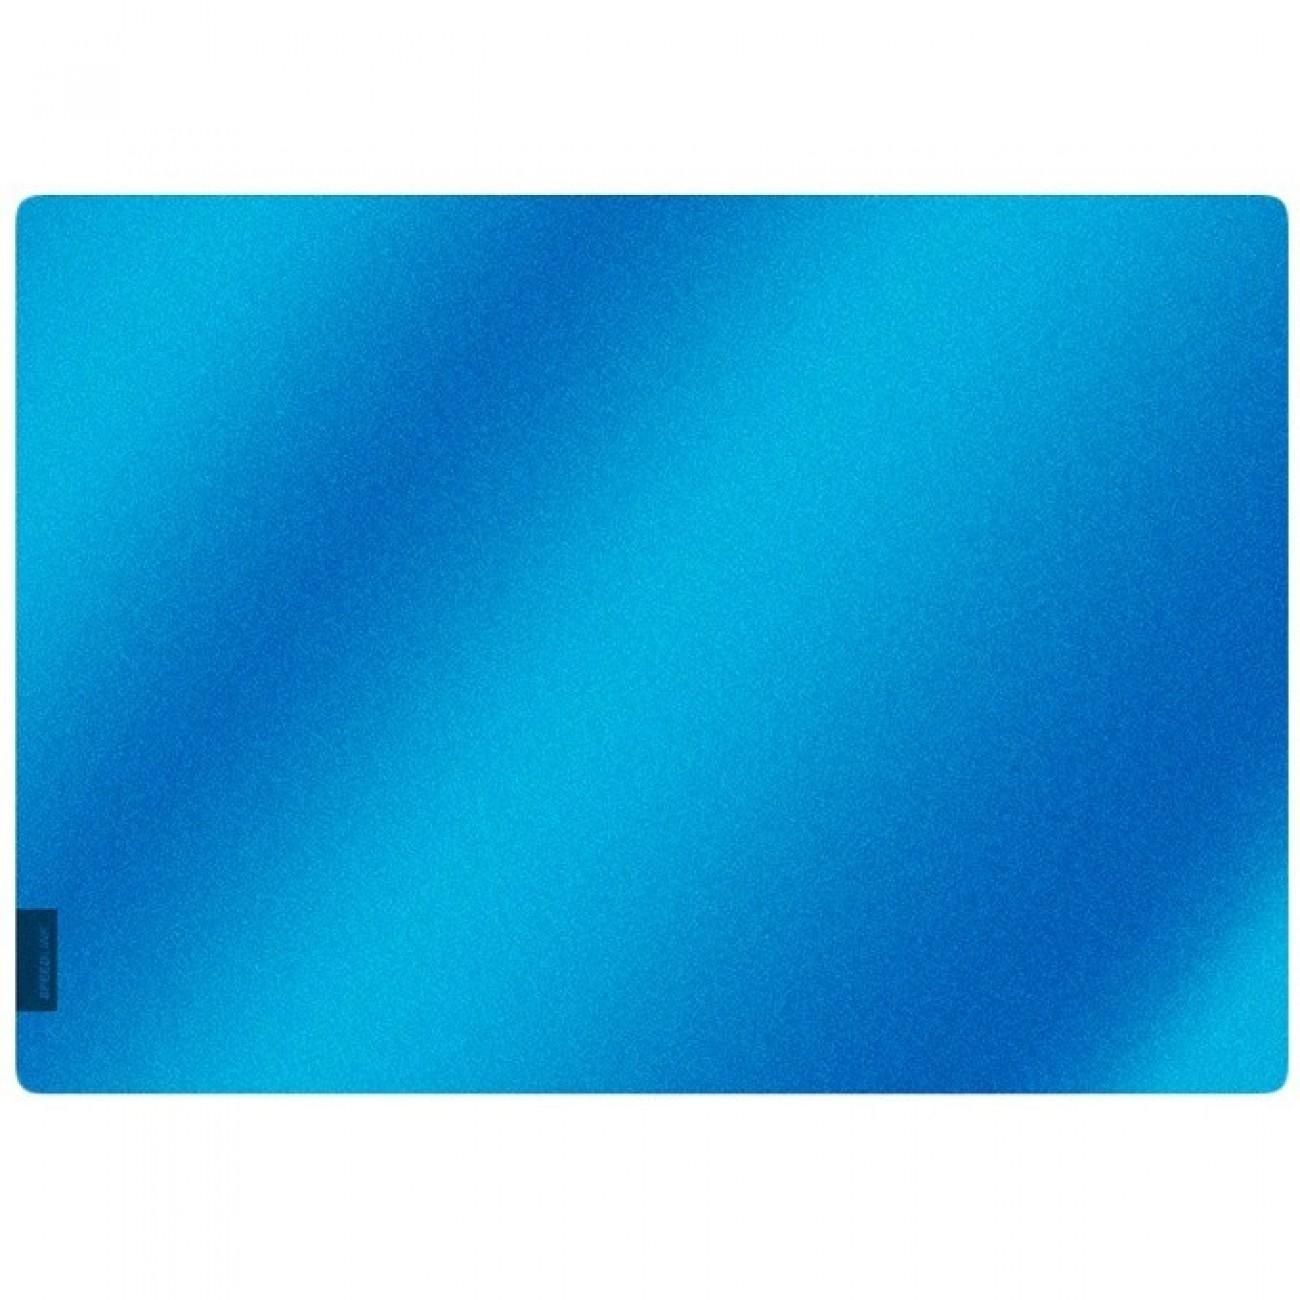 Подложка за мишка Speedlink Icecap, синя, 290 x 210 x 15mm в Подложки за мишки -  | Alleop